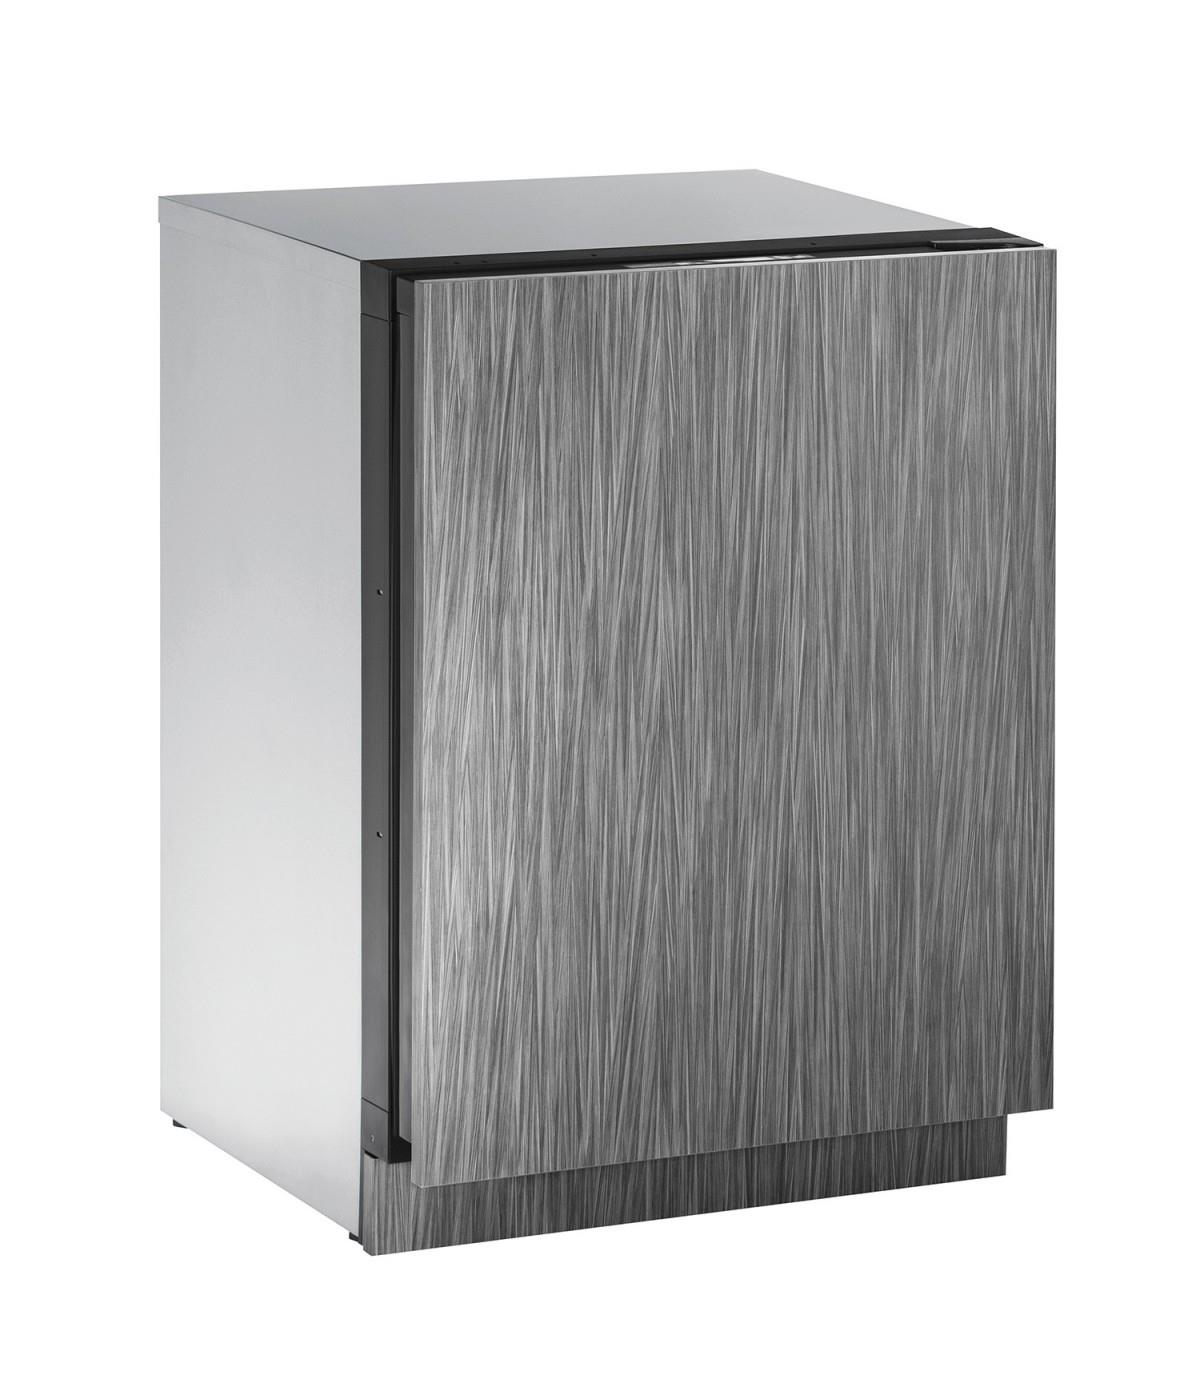 "U-Line Refrigerators 24"" Solid Door Compact Refrigerator - Item Number: U-3024RINT-00A"